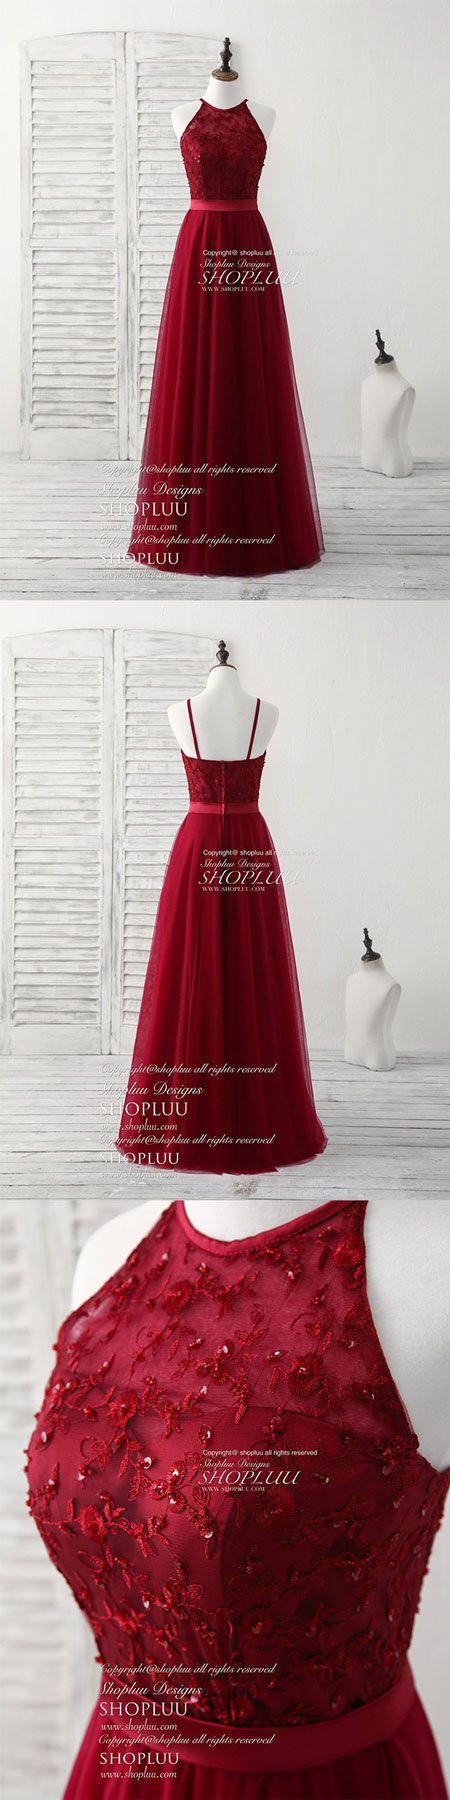 Burgundy tulle lace long prom dress, burgundy bridesmaid dress